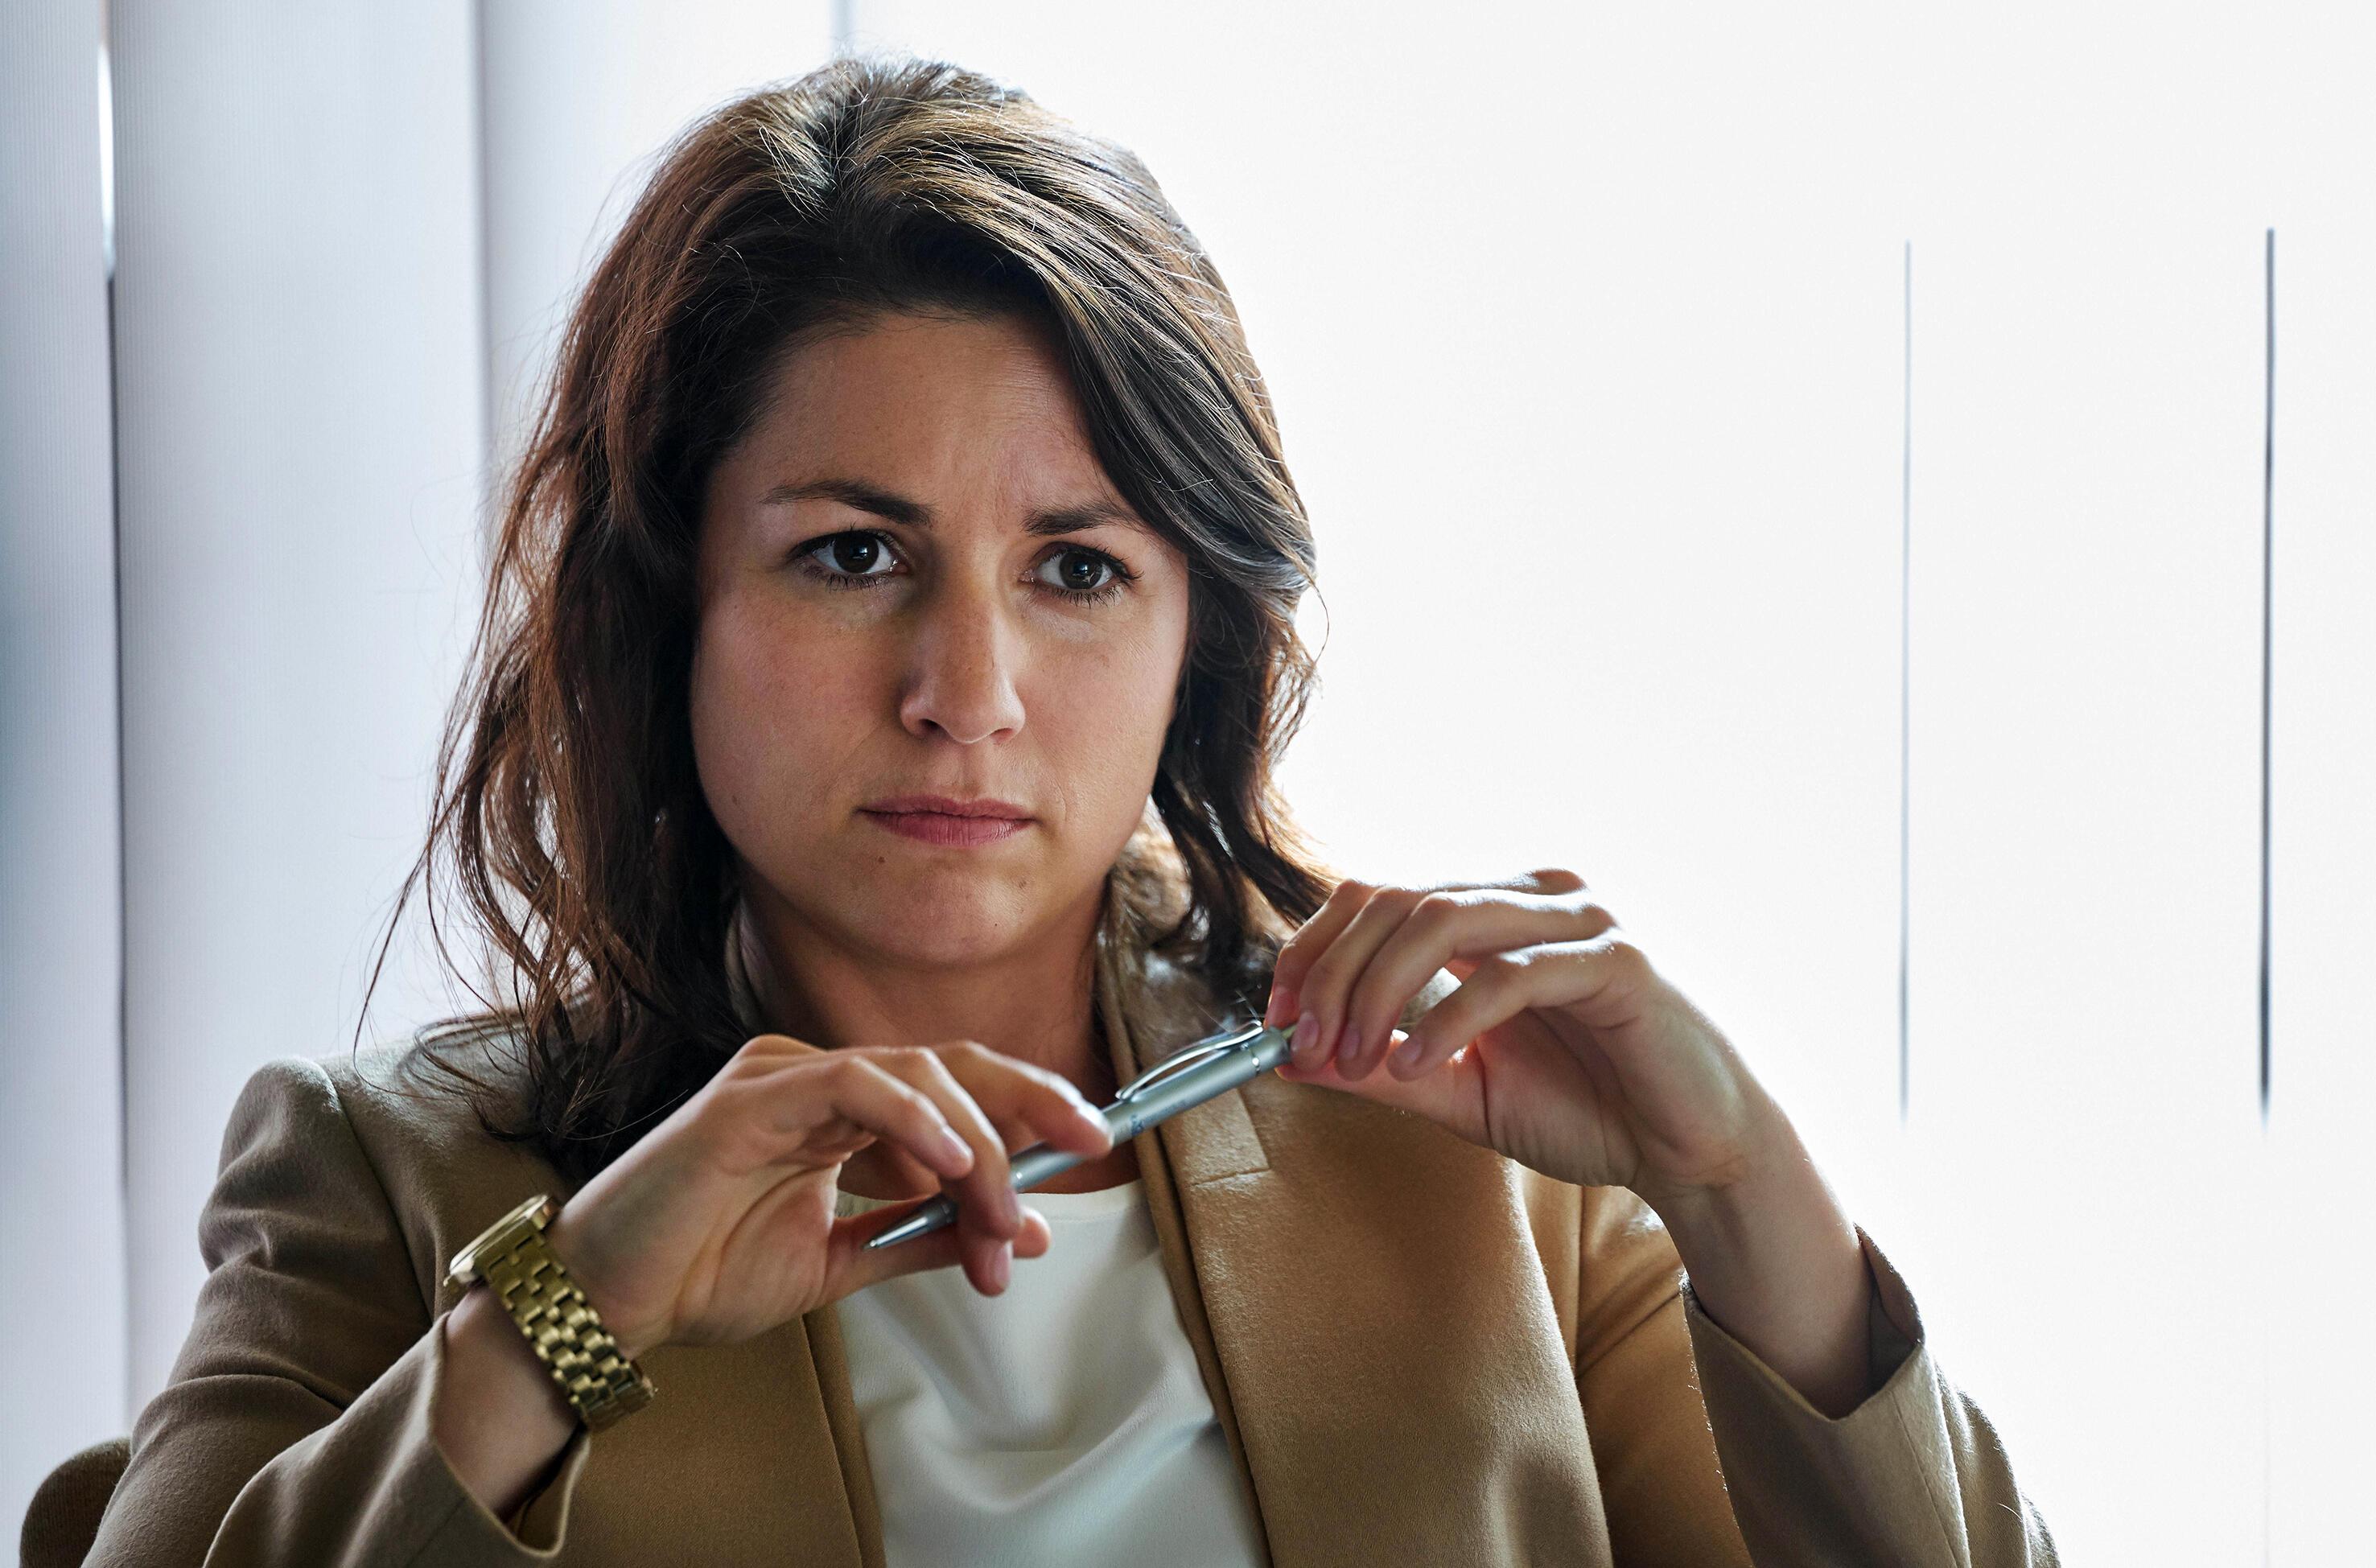 Eva Meckbach | Bild 1 von 2 | Moviepilot.de